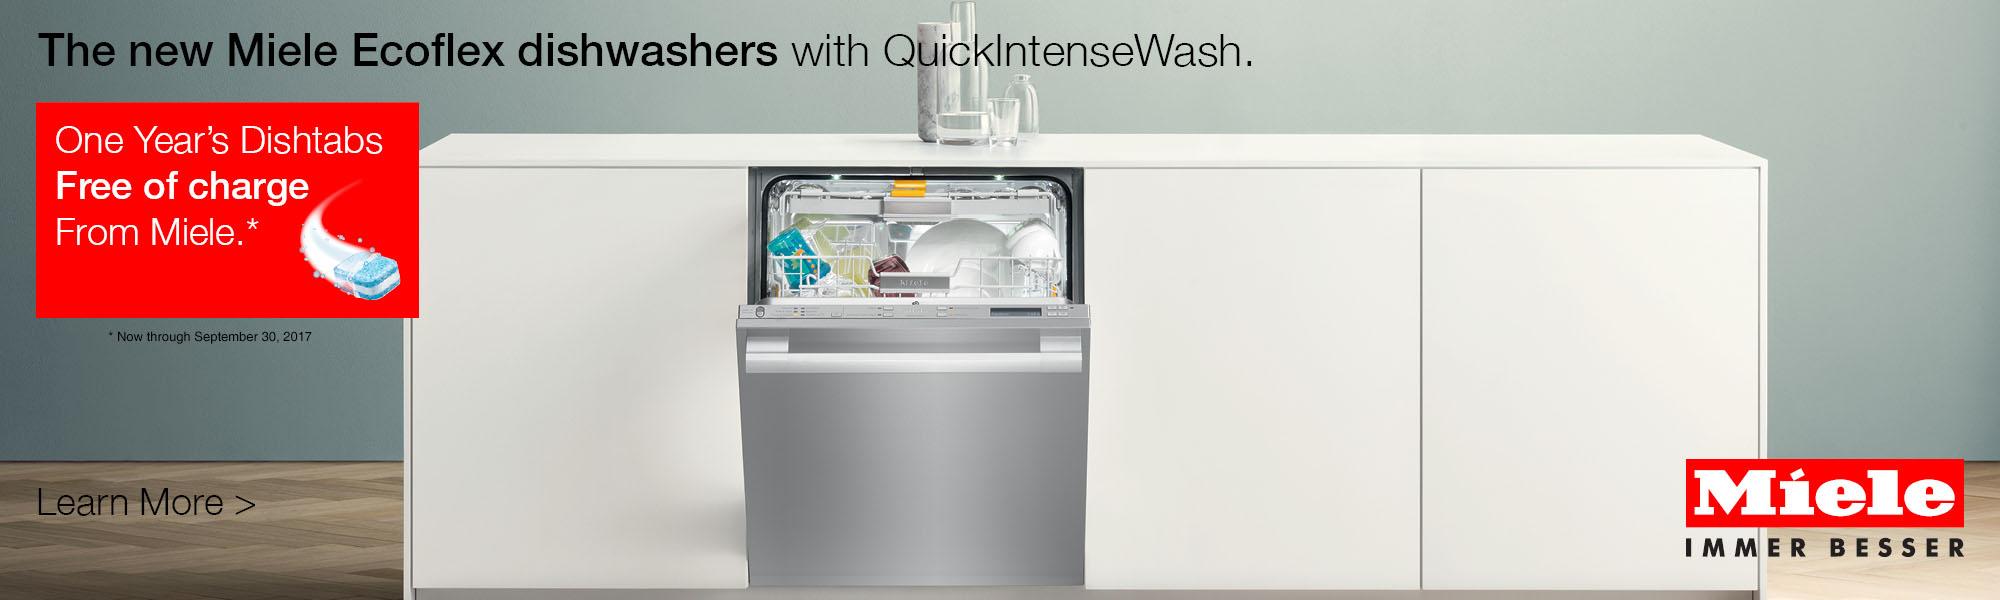 Miele Dishwasher member banner